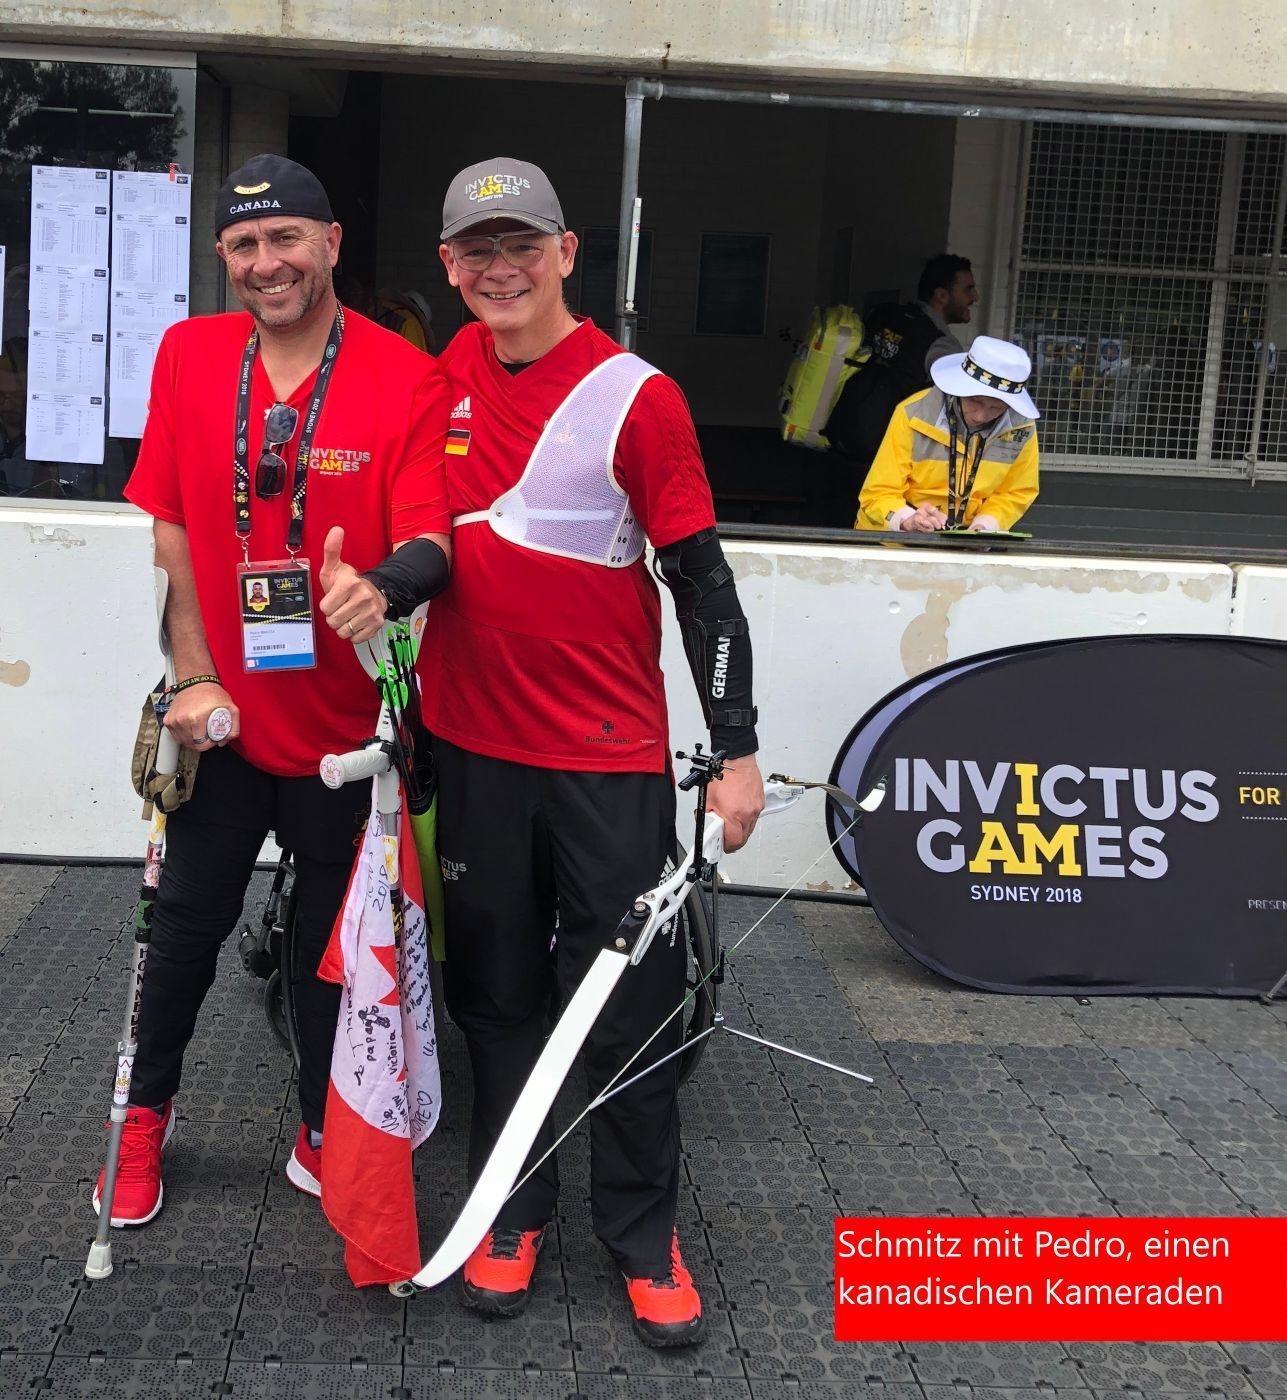 Schmitz_Sydney Invictus Games 2018_3_InPixio